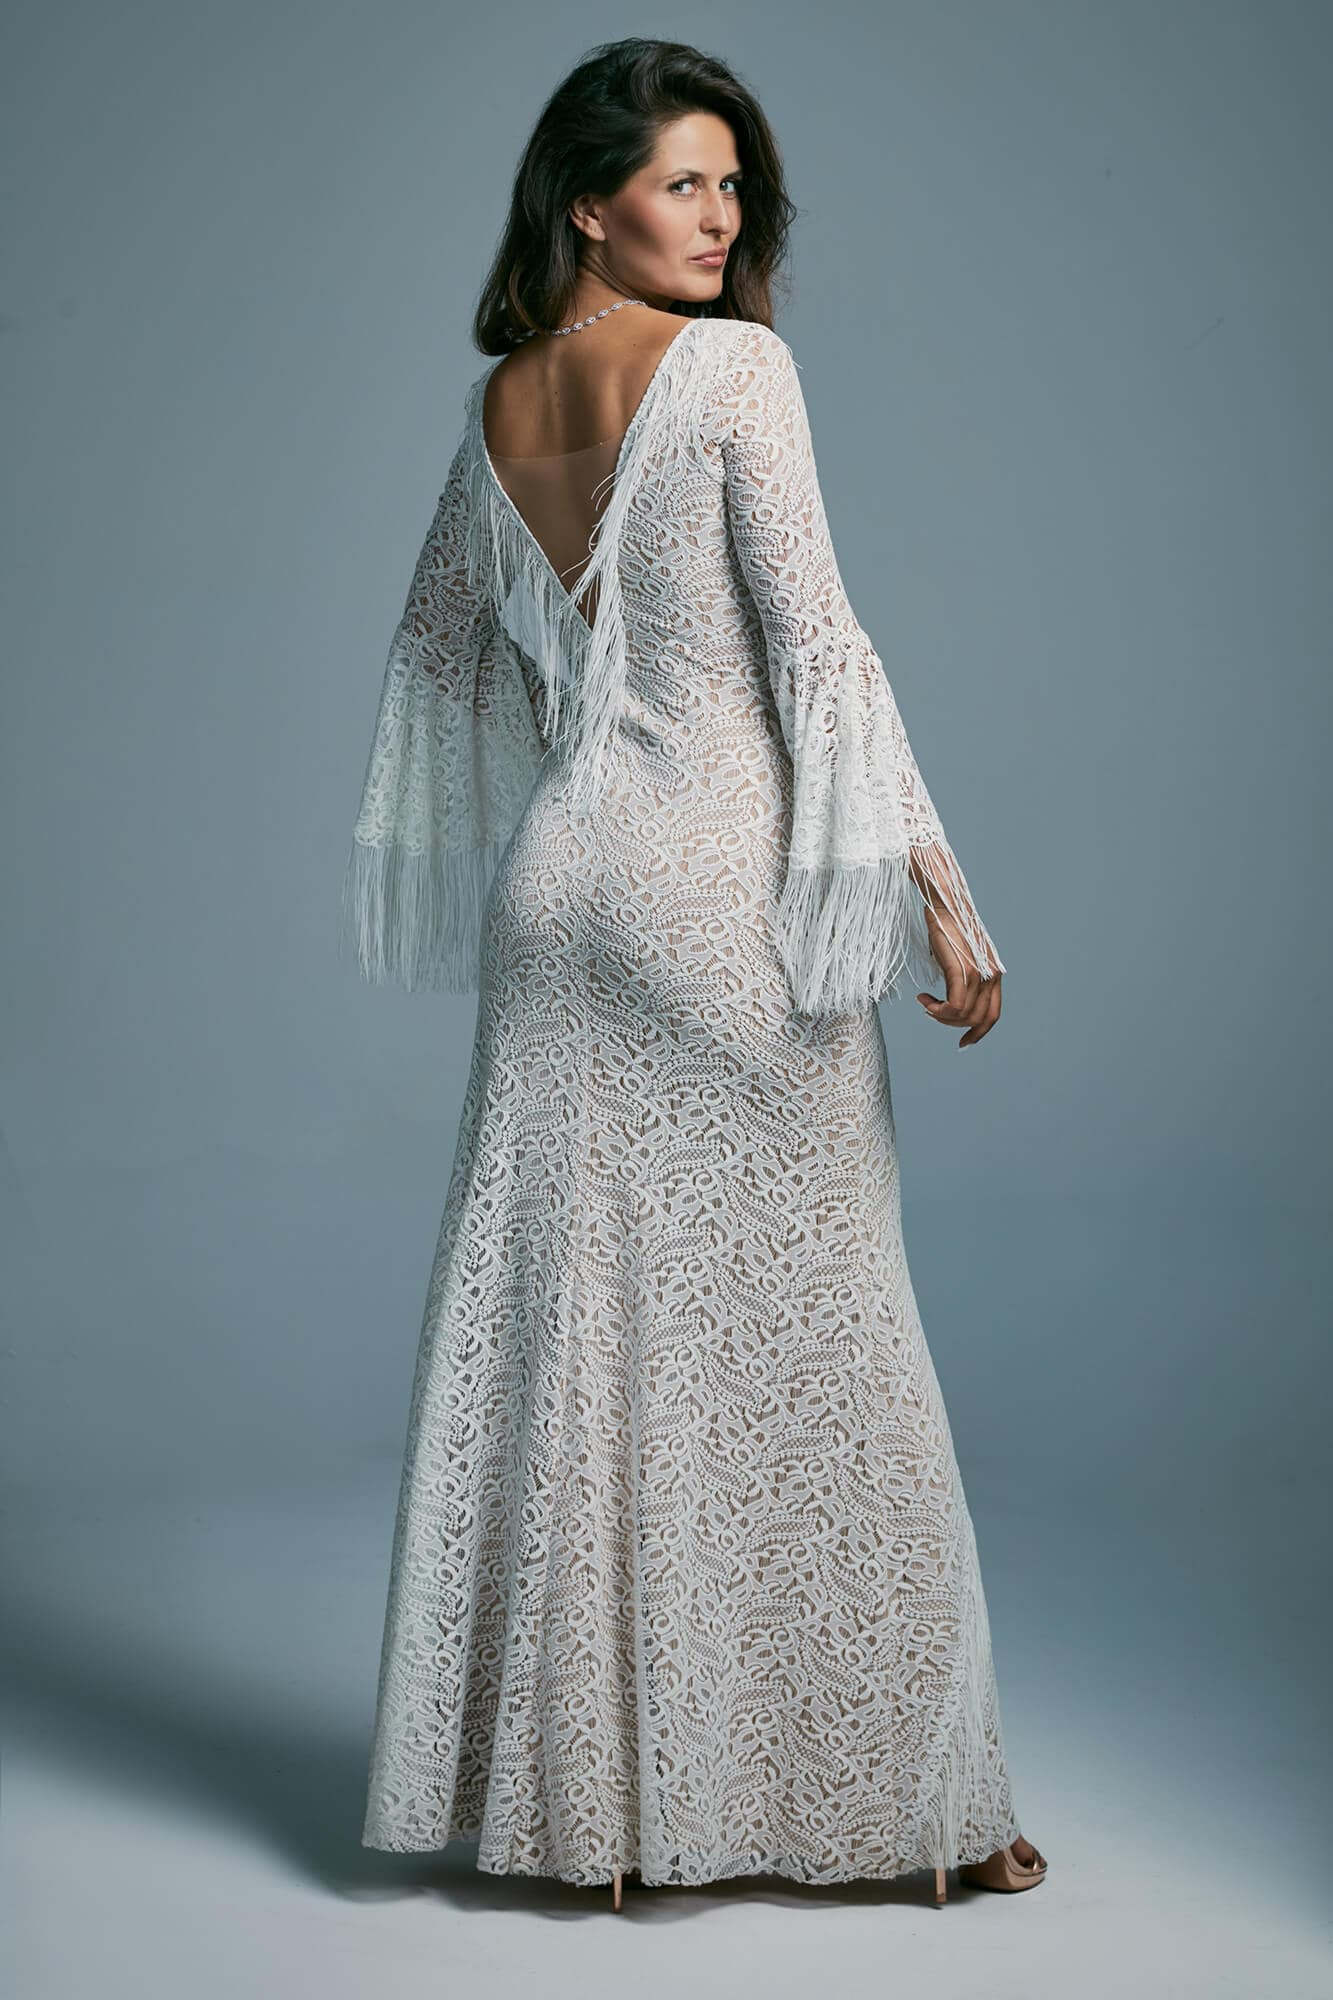 Beautifully finished wedding dress shaping the figure Porto 46